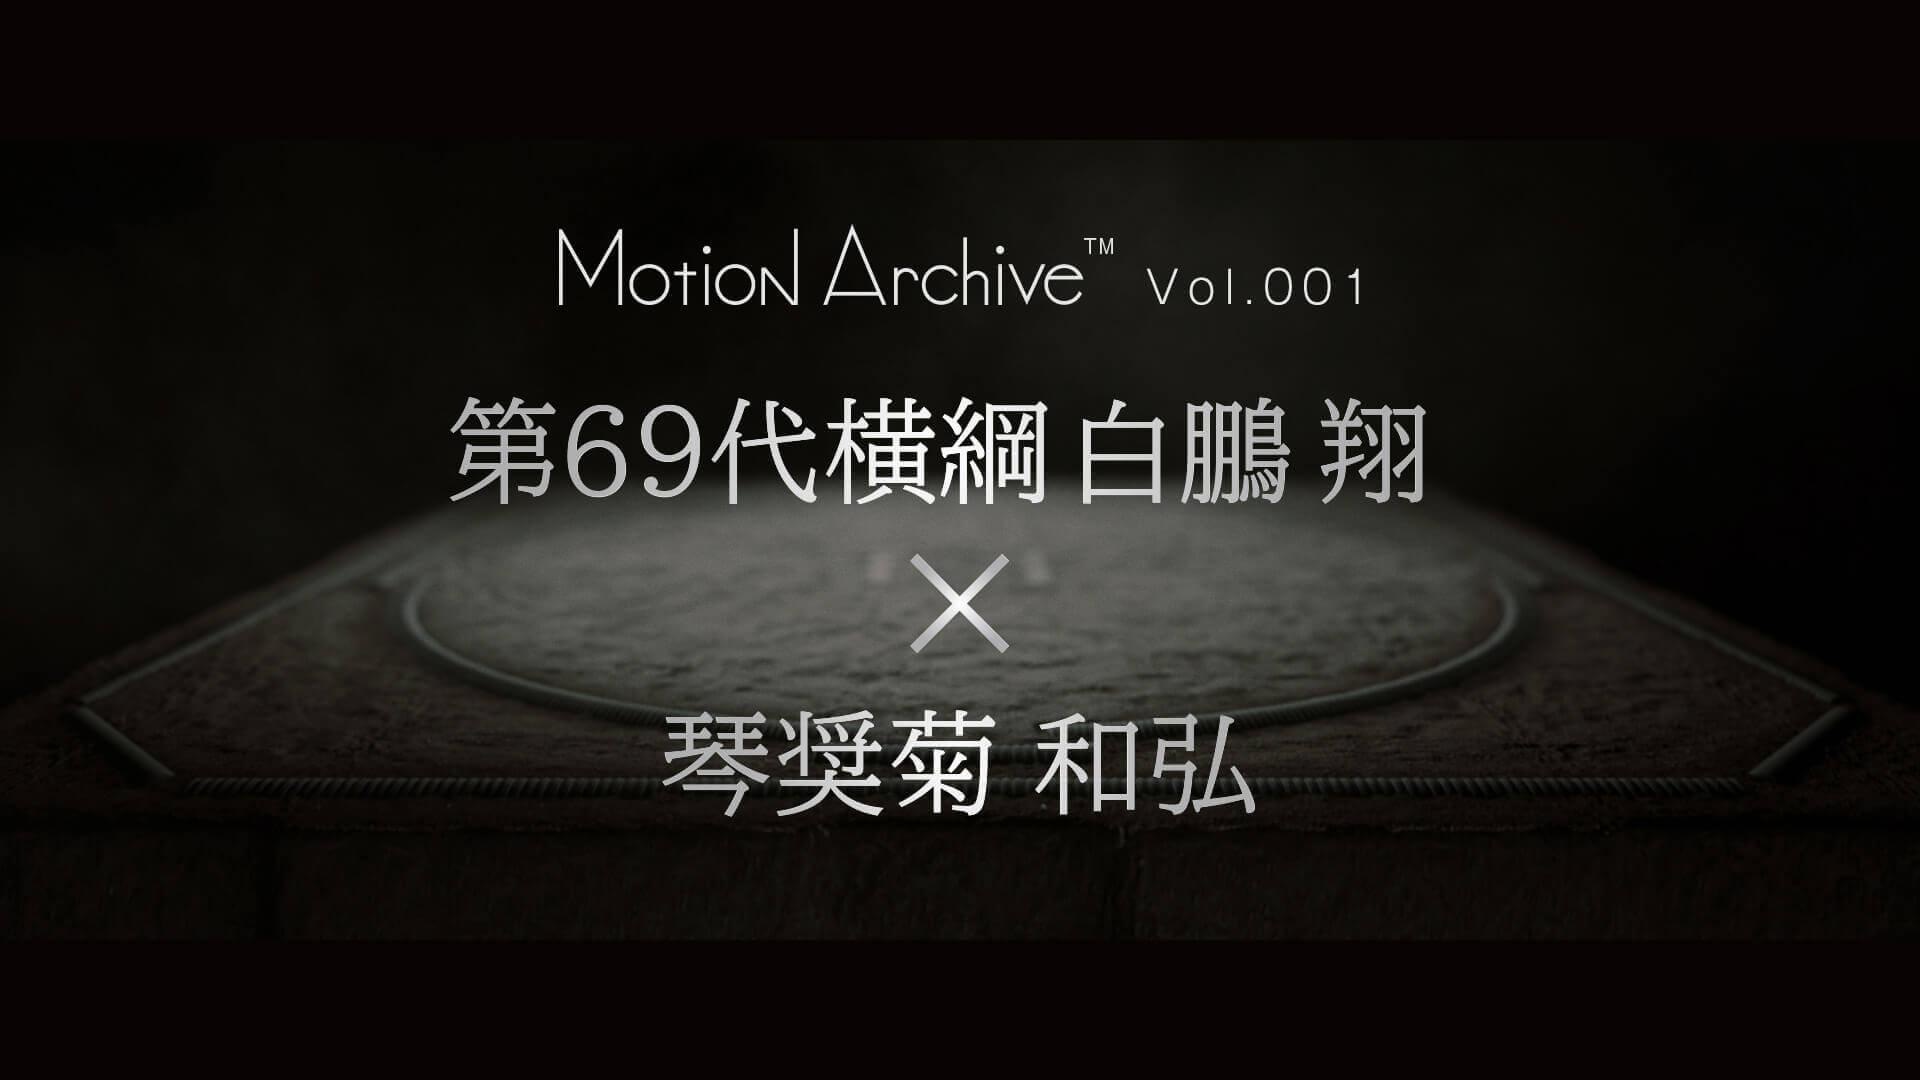 Motion Archive™ vol.001 第69代横綱 白鵬 翔 × 琴奨菊 和弘